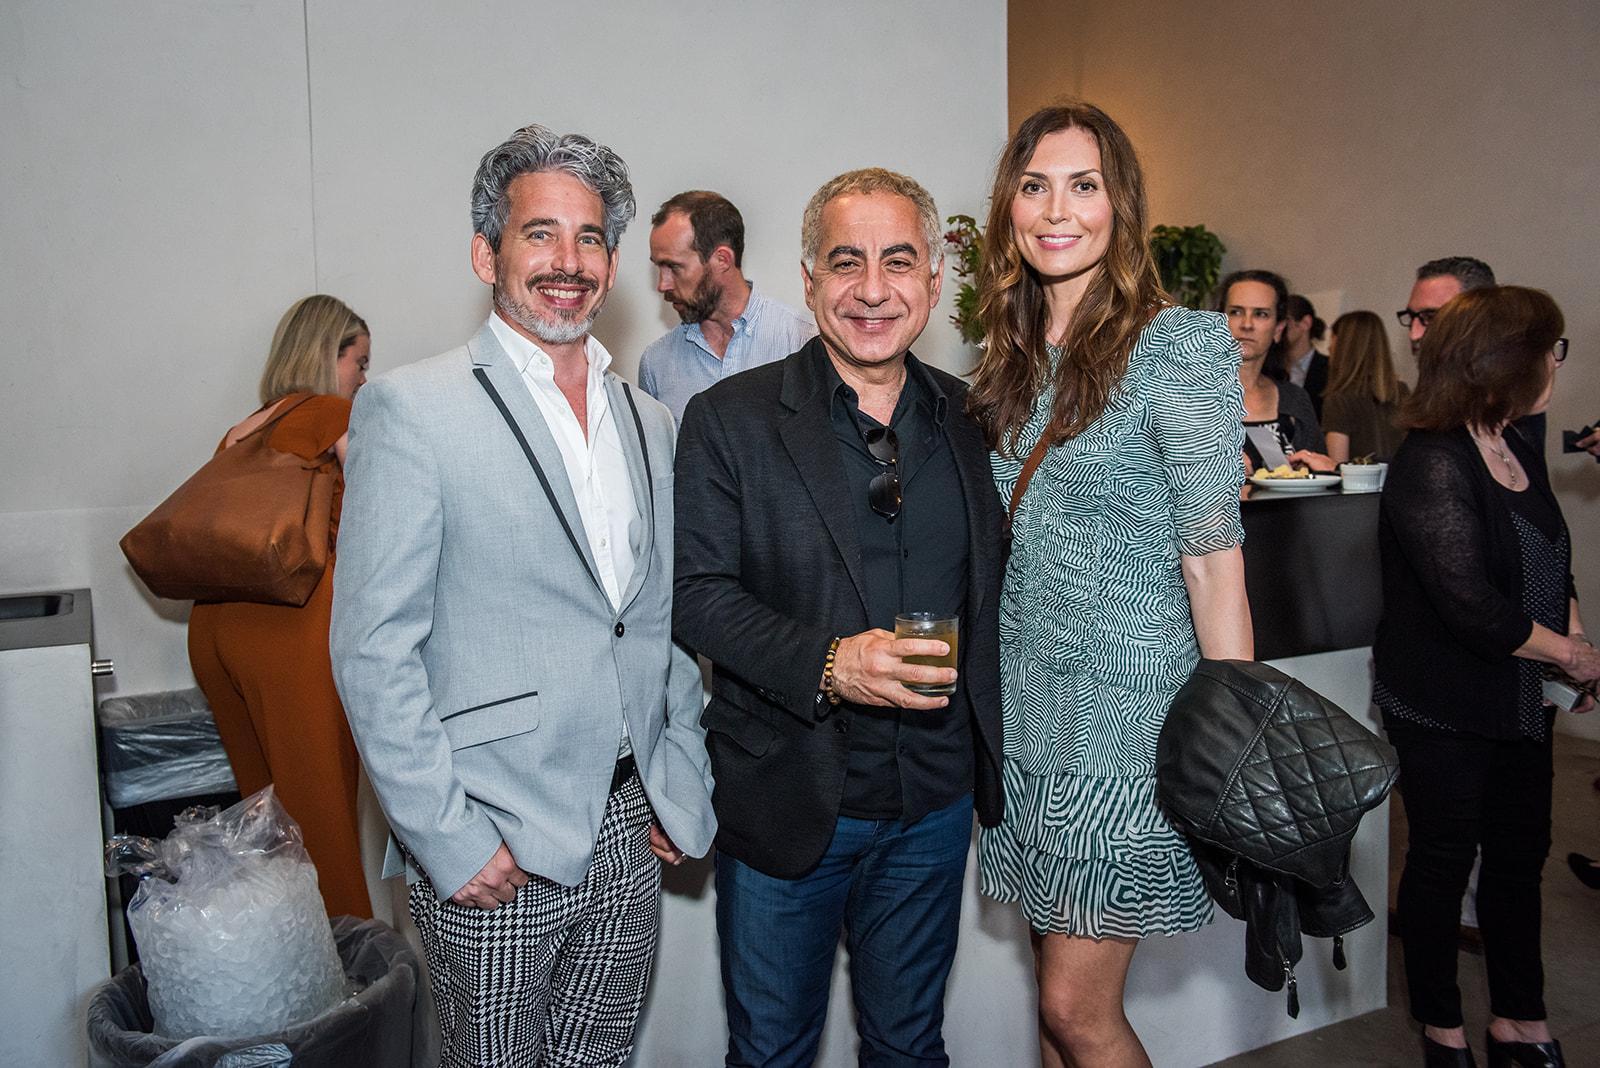 Scott Harris, Marwan Al-Sayed and Joanna Parol